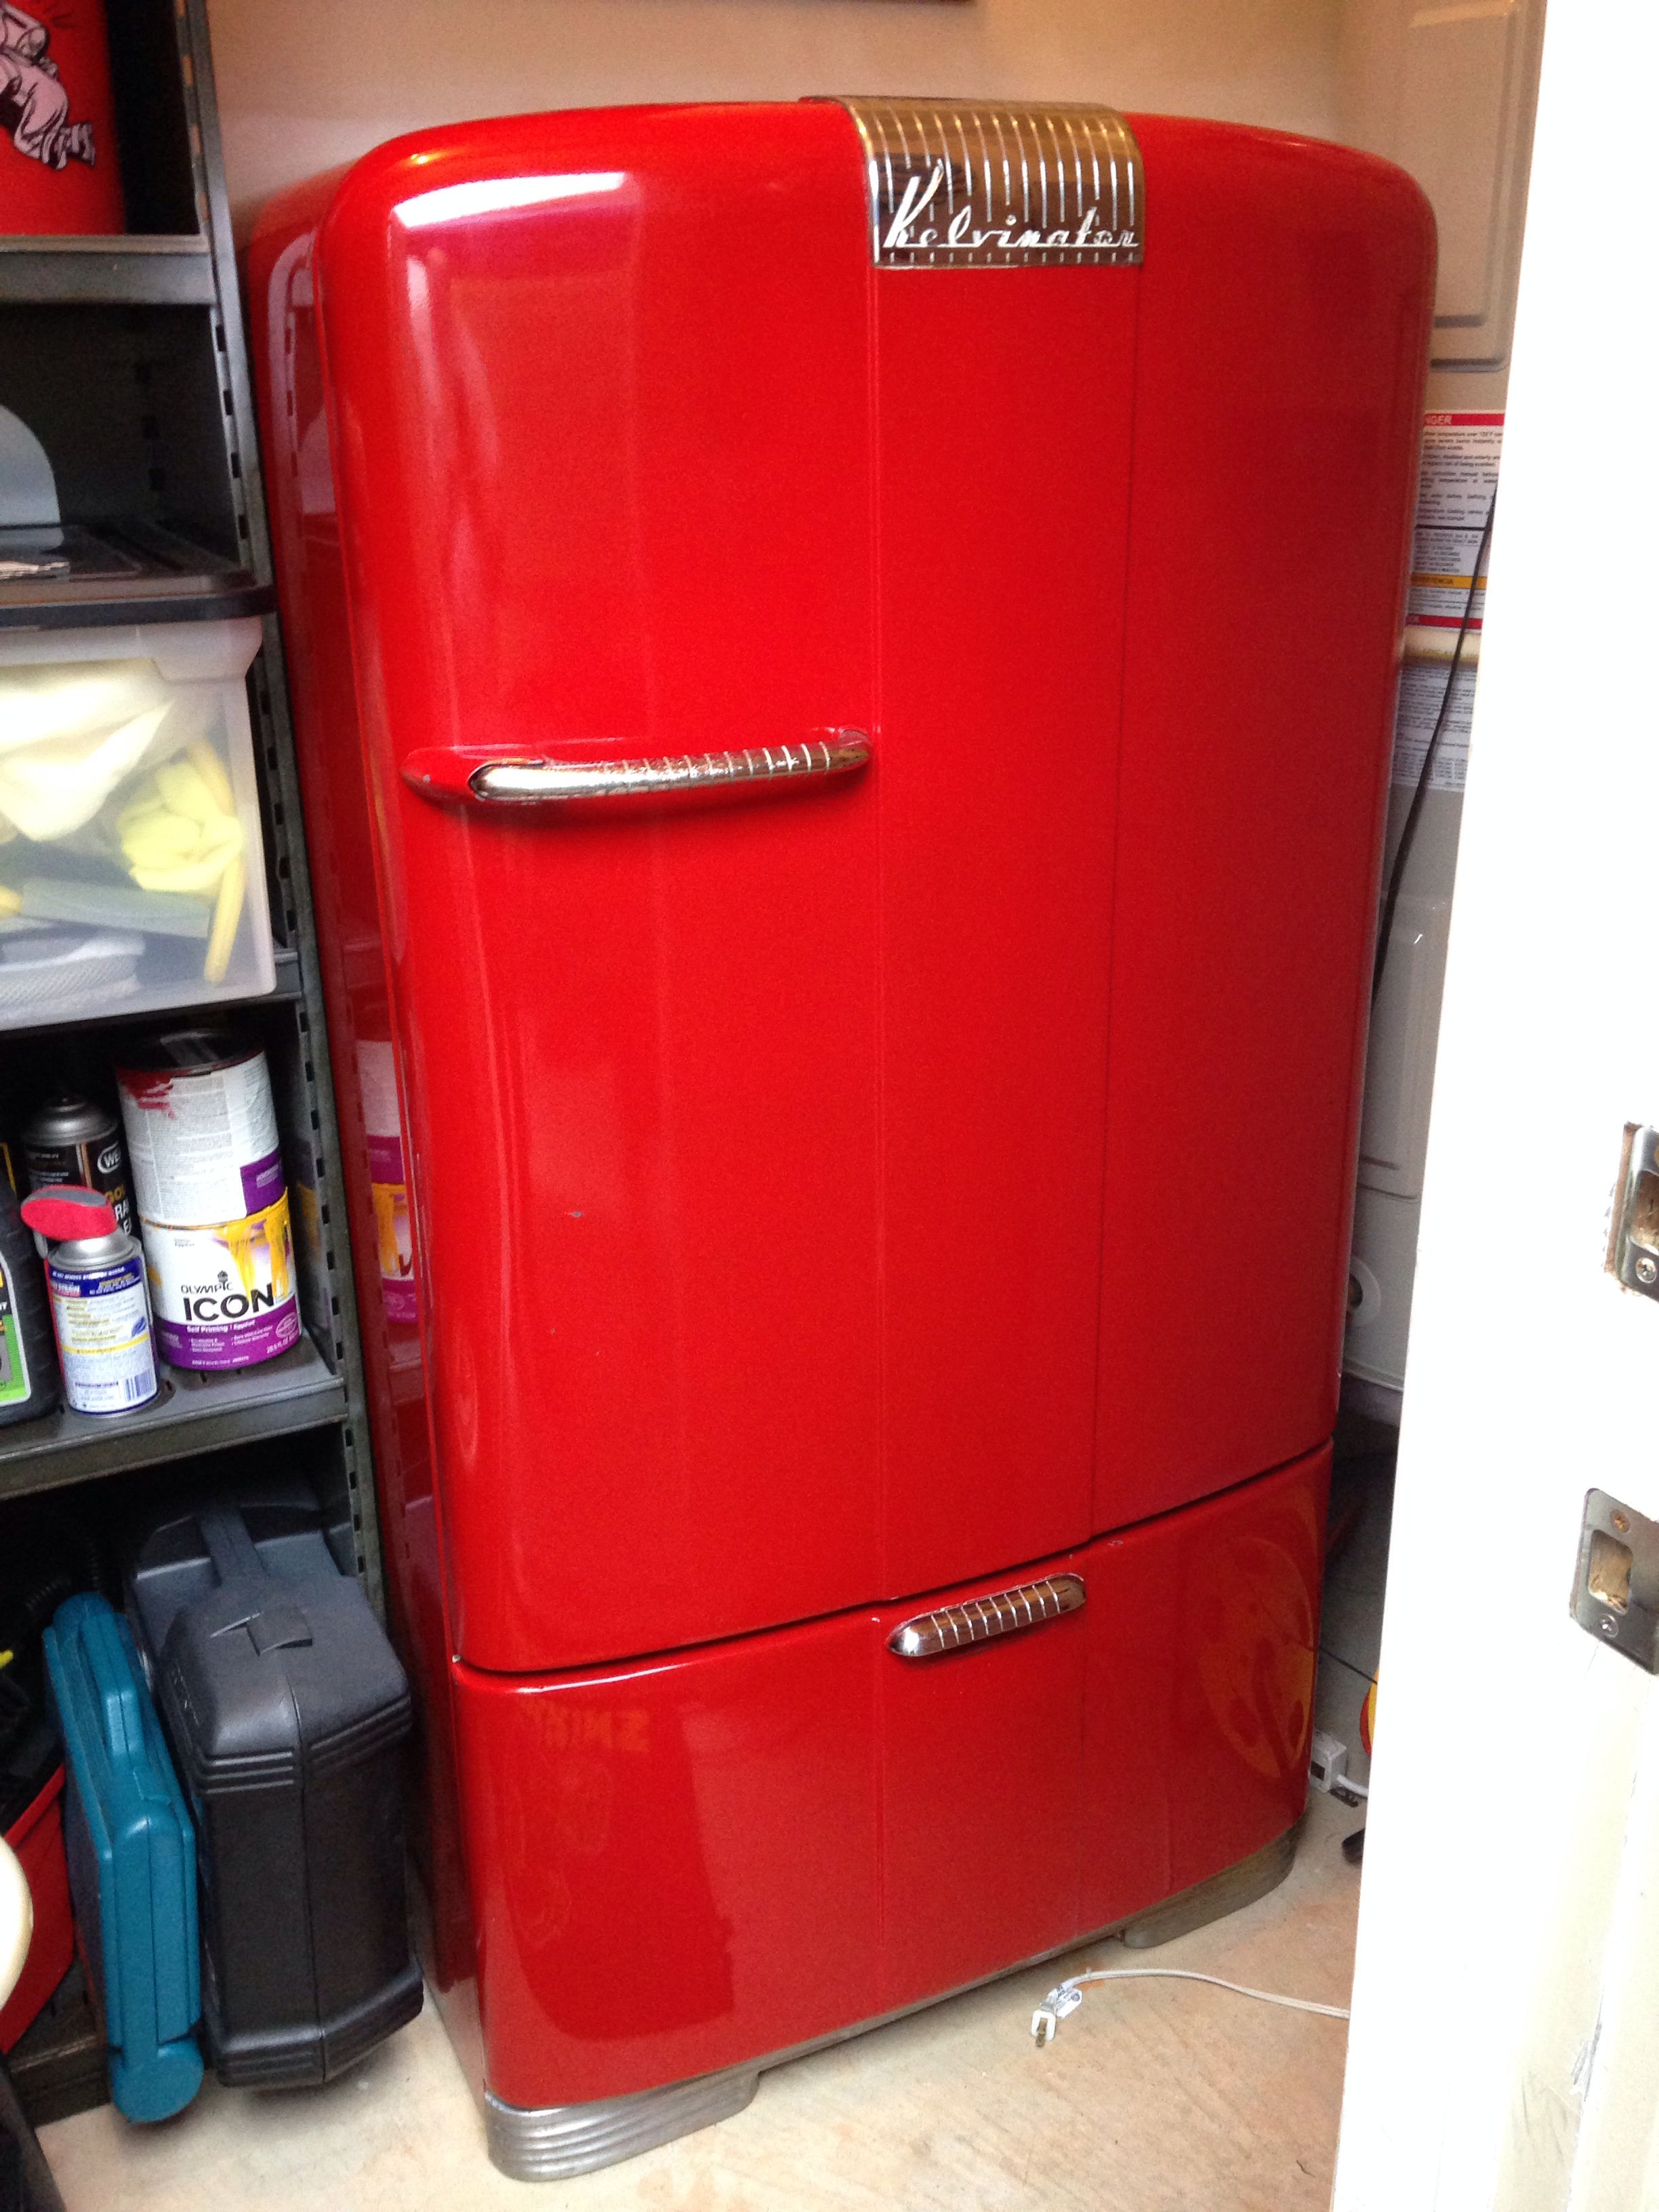 1946 kelvinator refrigerator collectables pinterest 1946 kelvinator refrigerator swarovskicordoba Images